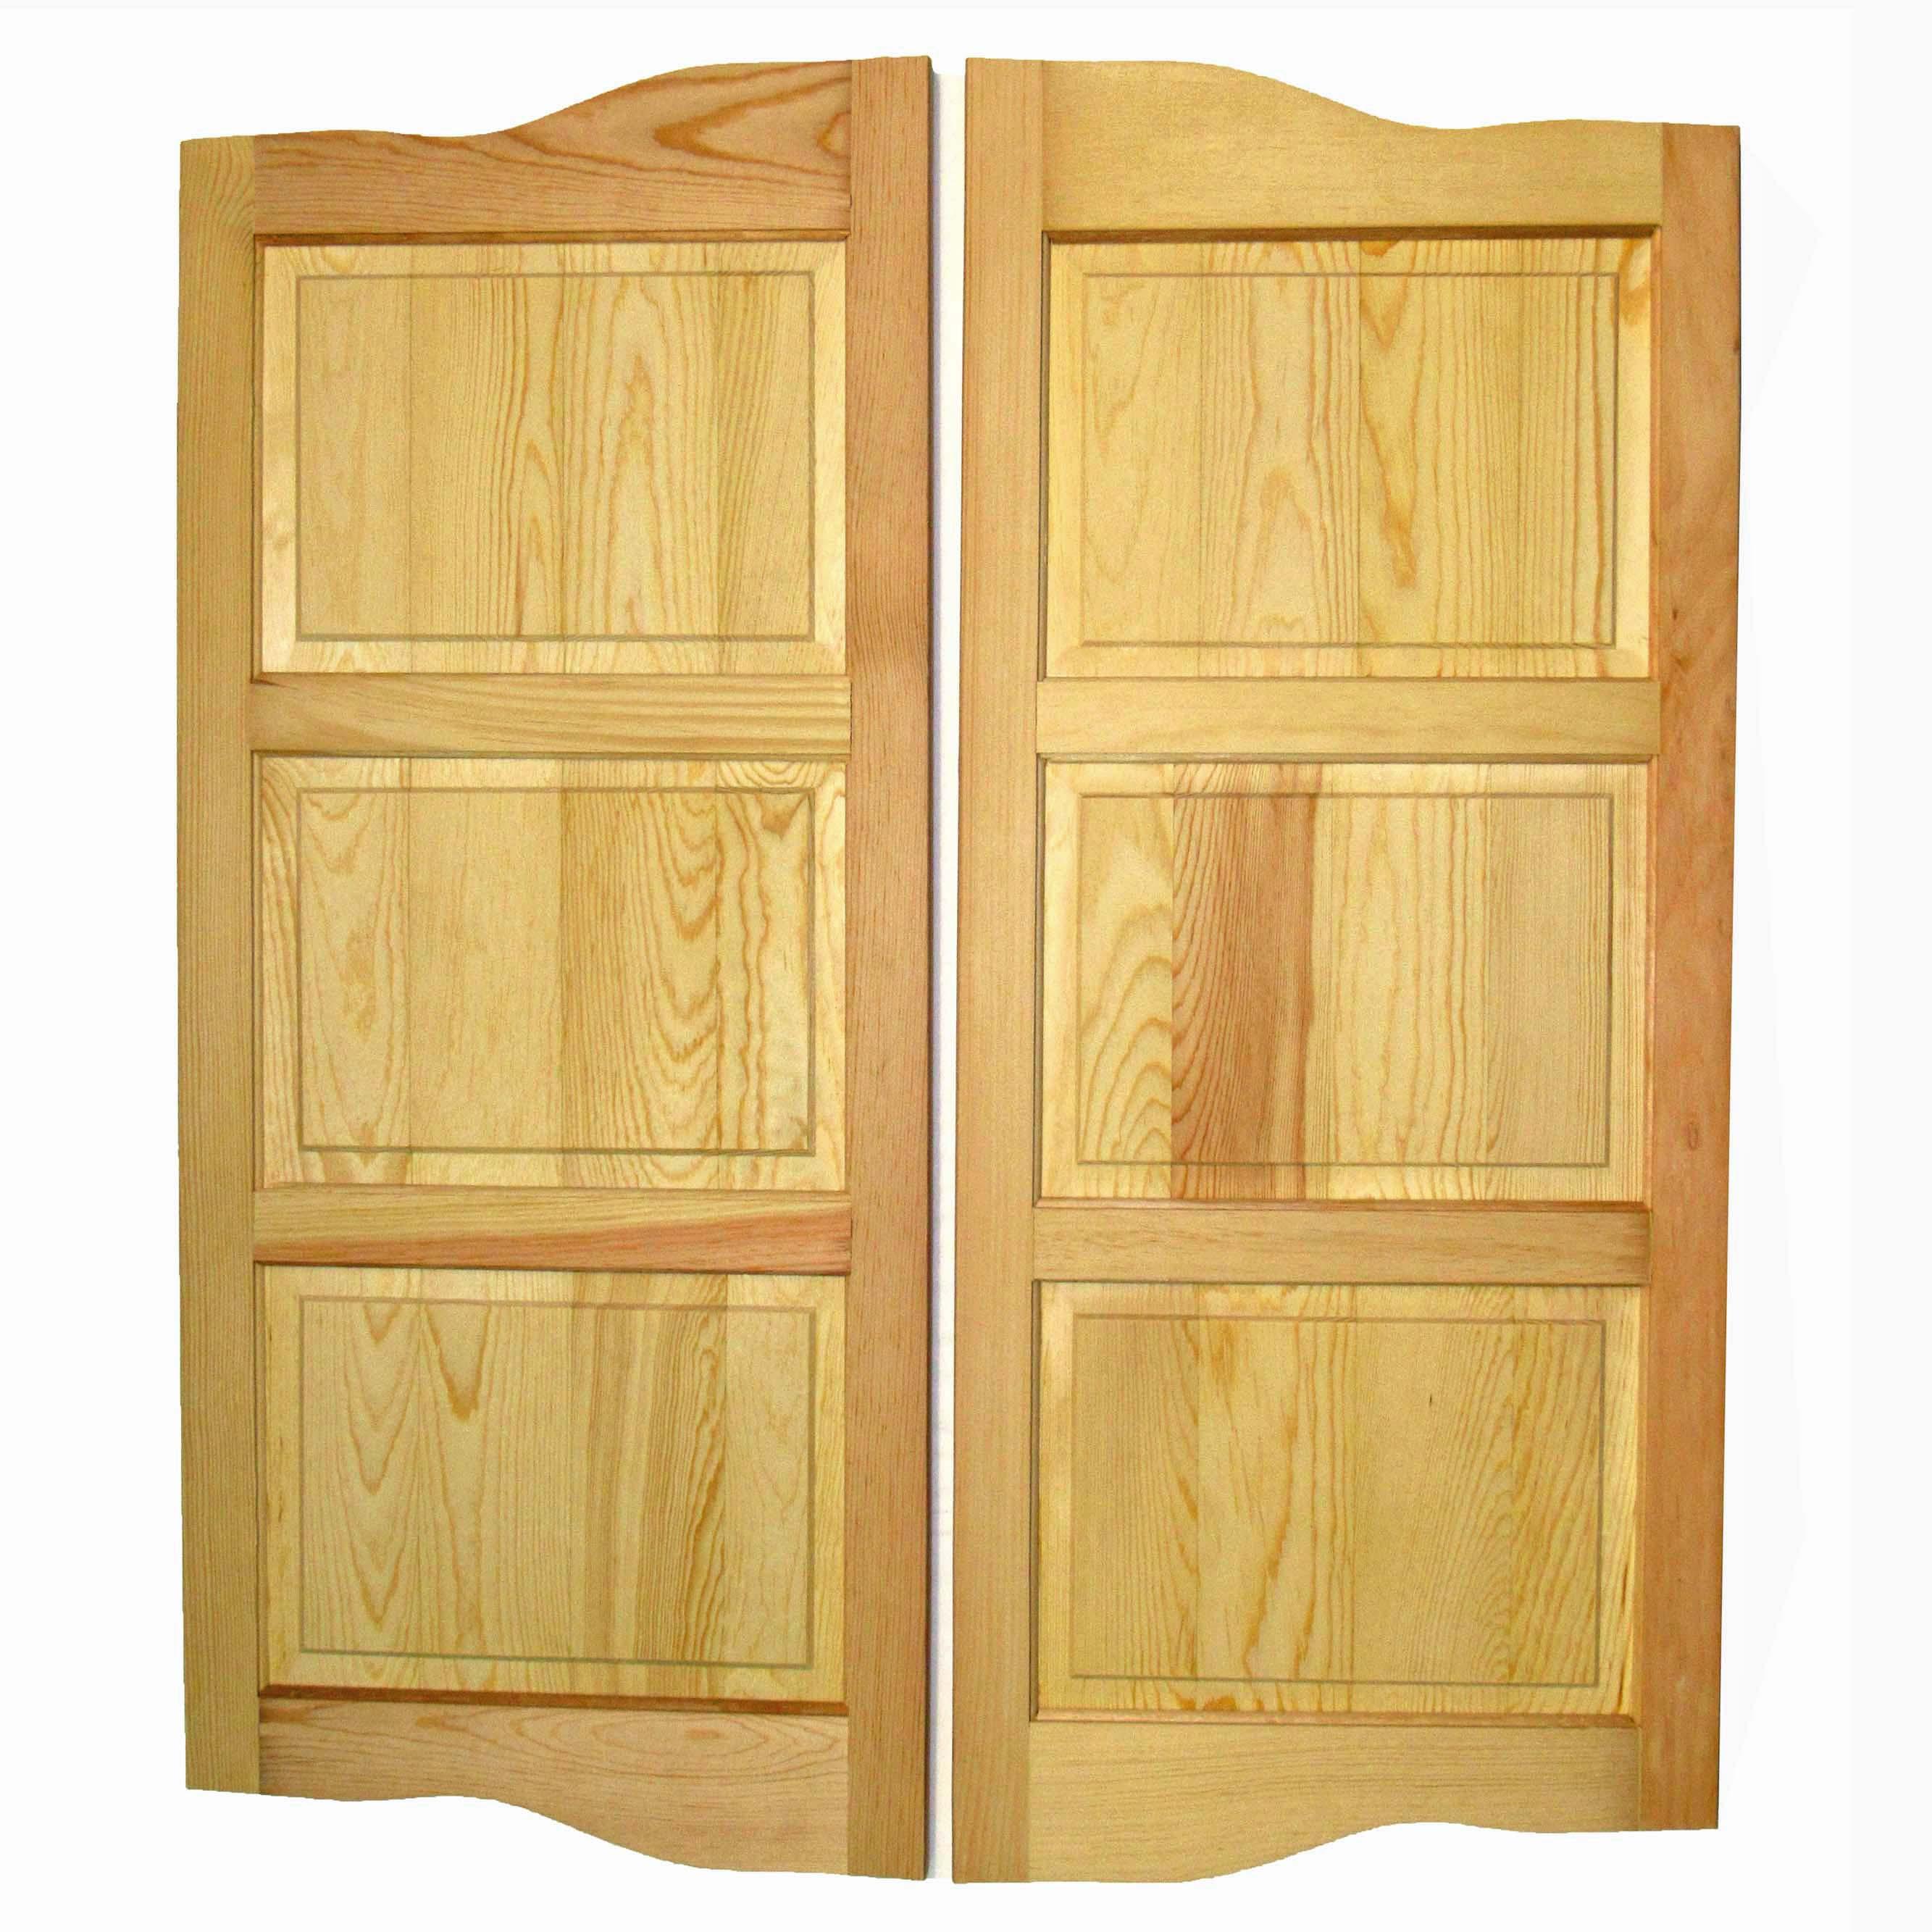 Raised Panel Cafe Doors  sc 1 st  Capitol City Lumber & Raised Panel Cafe Doors - Capitol City Lumber